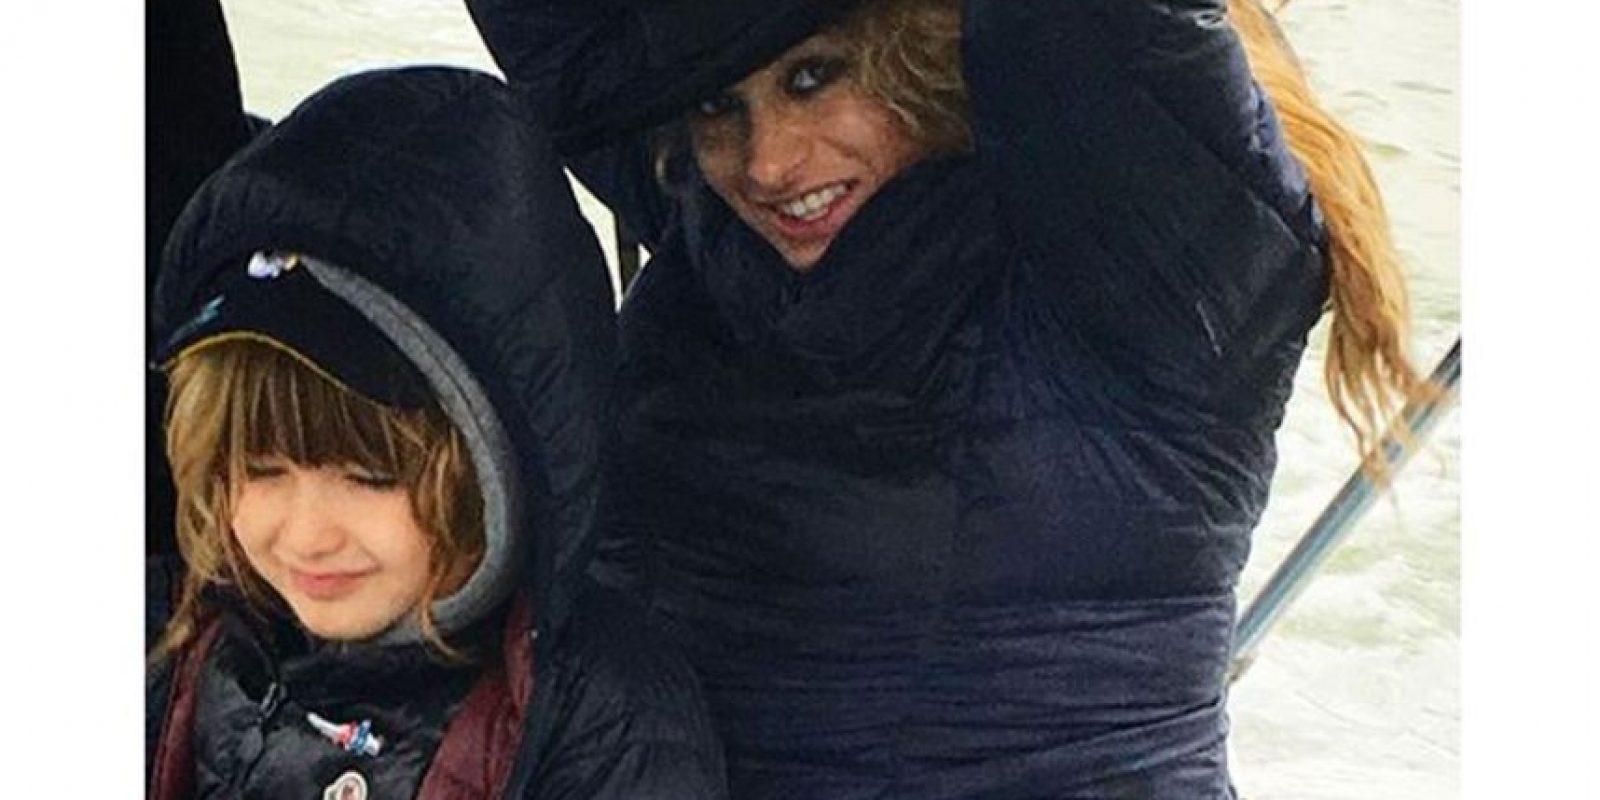 Paulina Rubio muestra su pancita en Instagram Foto:Instagram Paulina Rubio